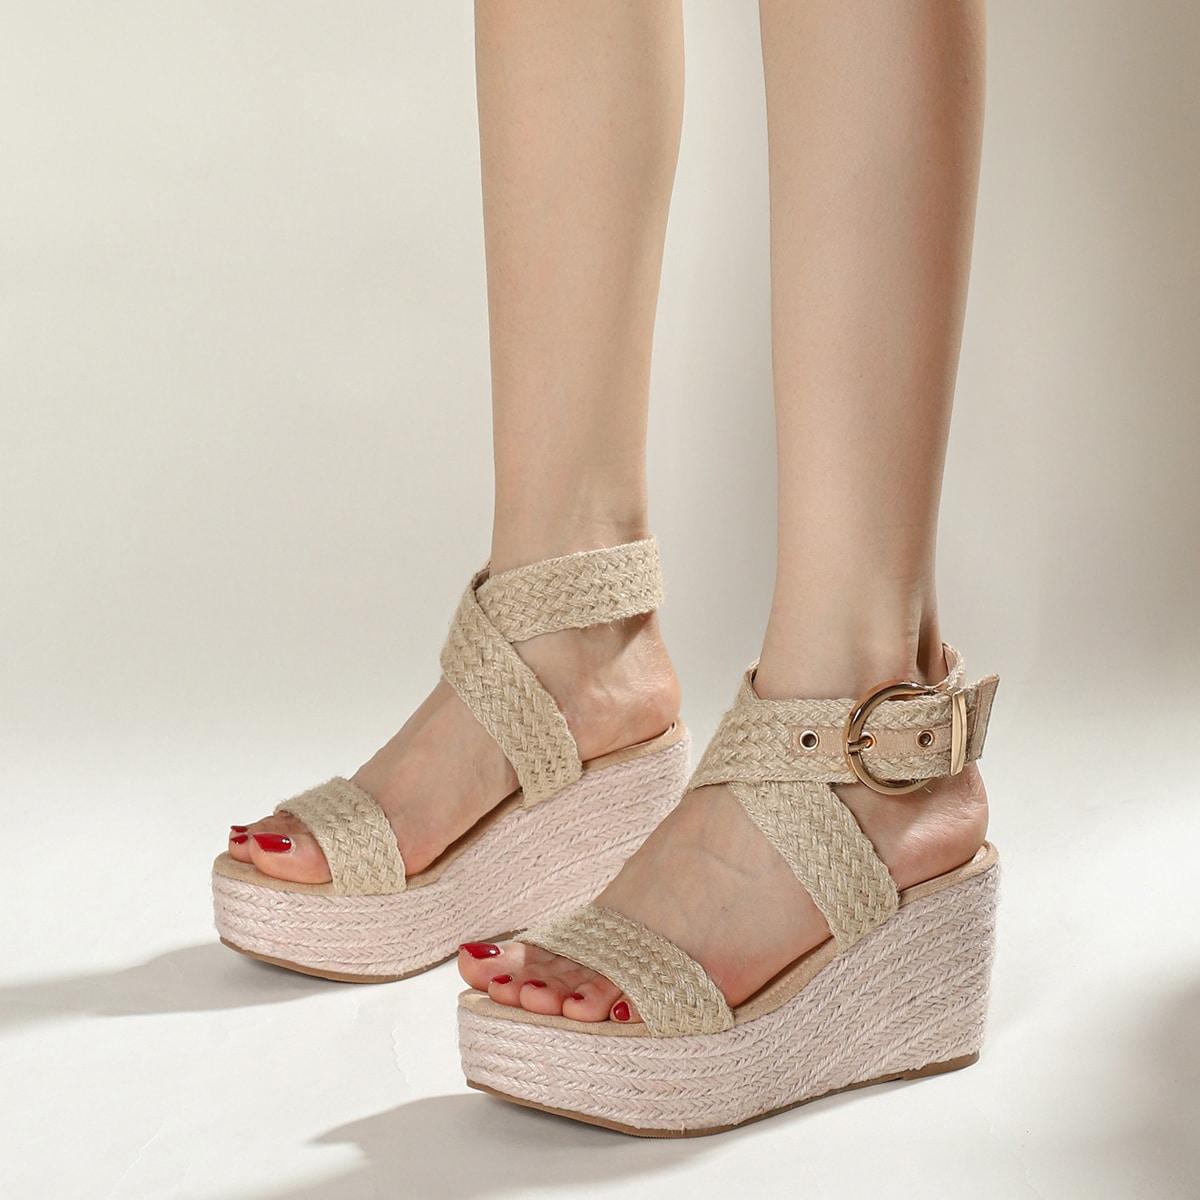 Woven Cross Strap Espadrille Wedge Sandals